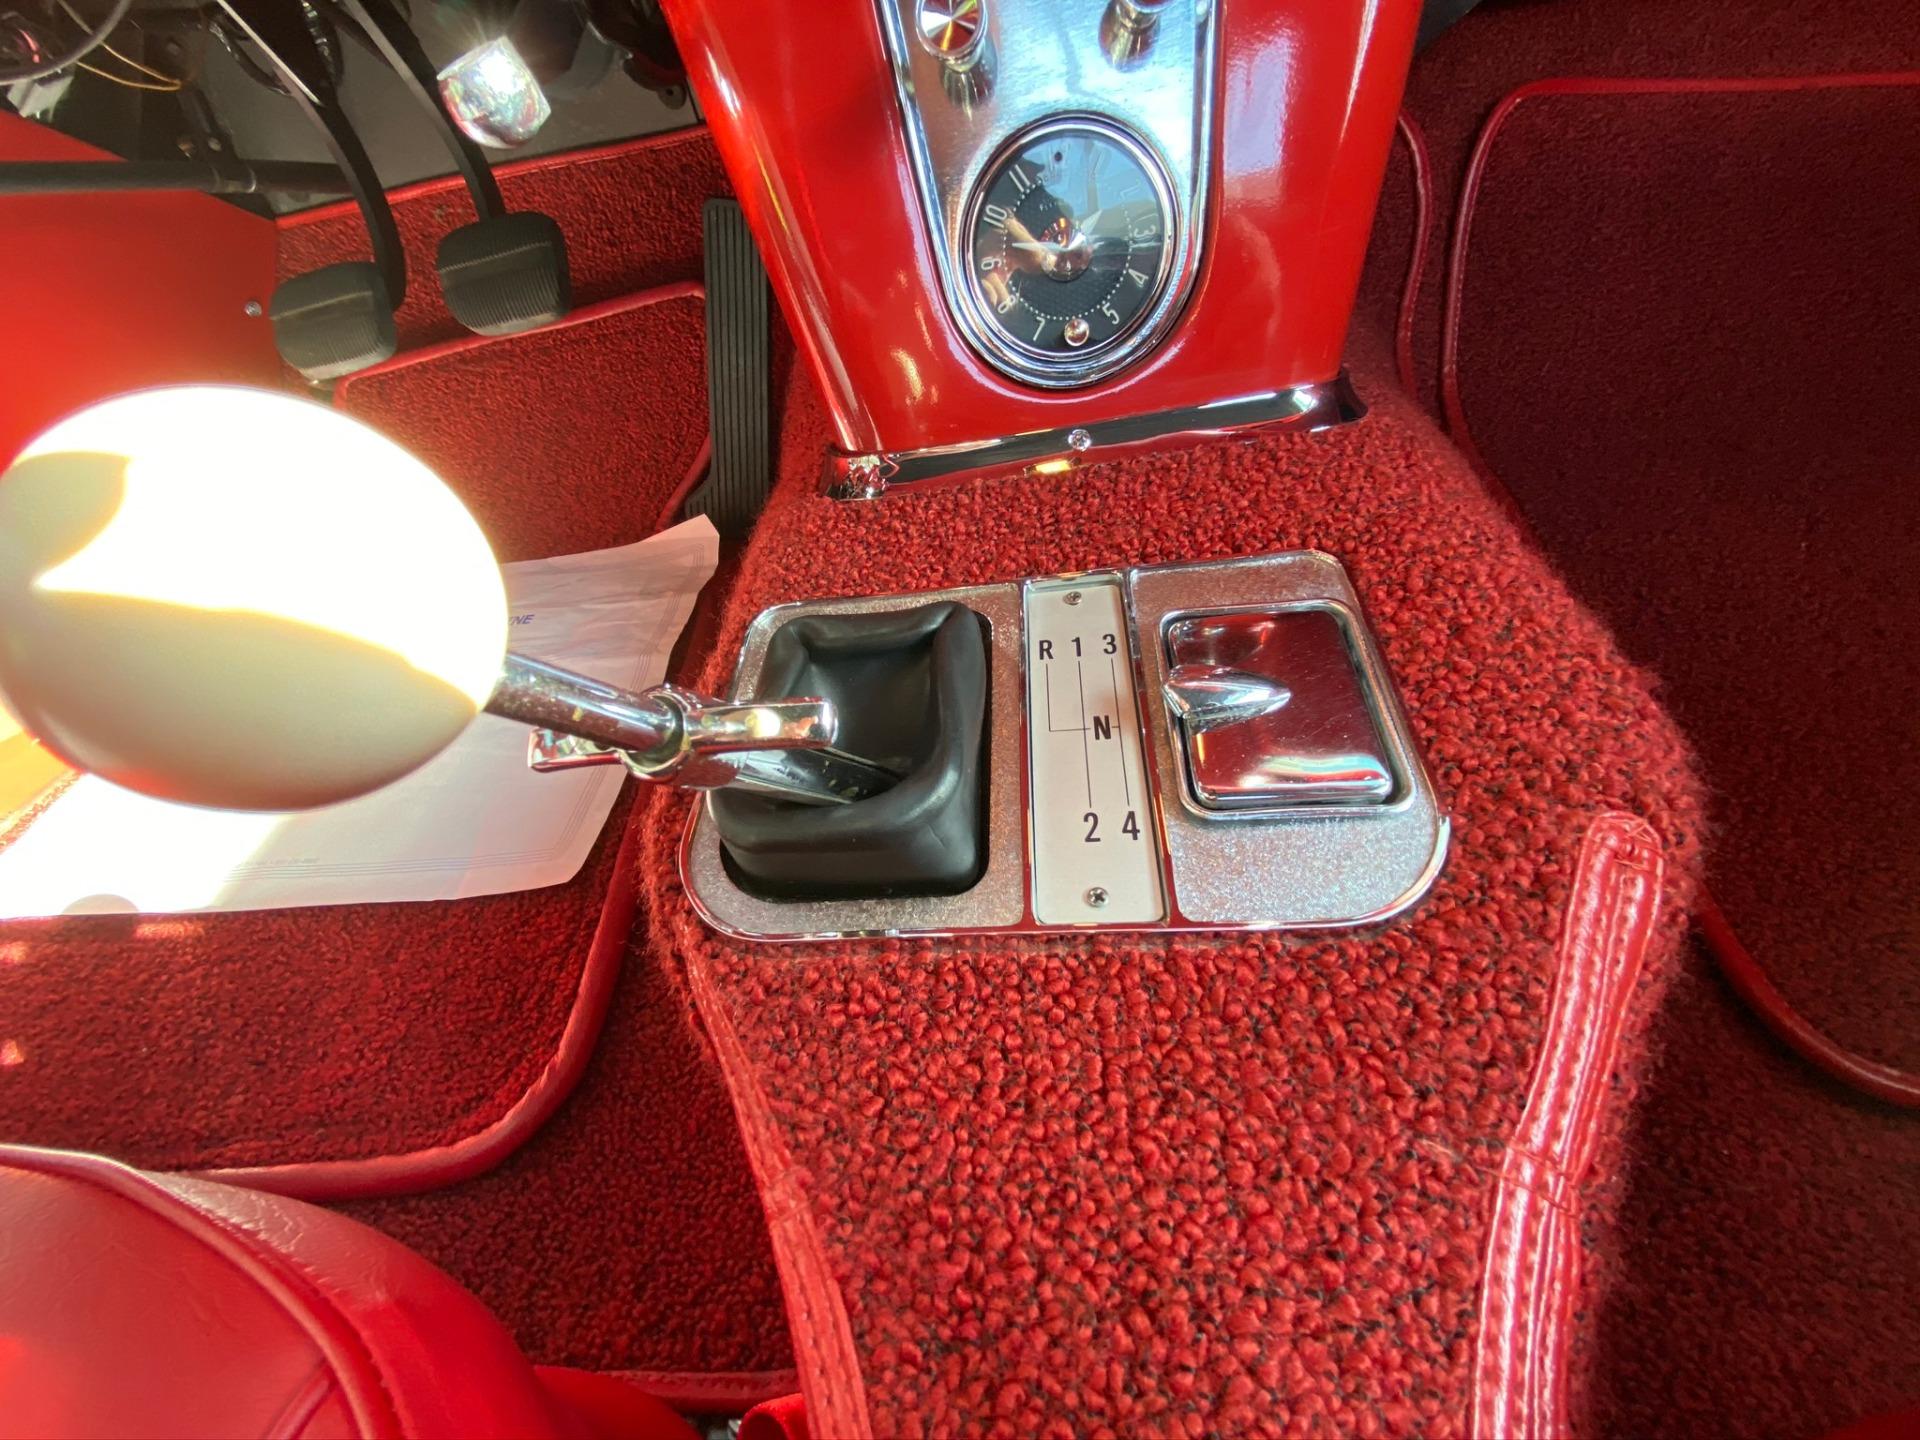 Used-1962-Chevrolet-Corvette-Convertible-RPO-582-Fuel-Injection